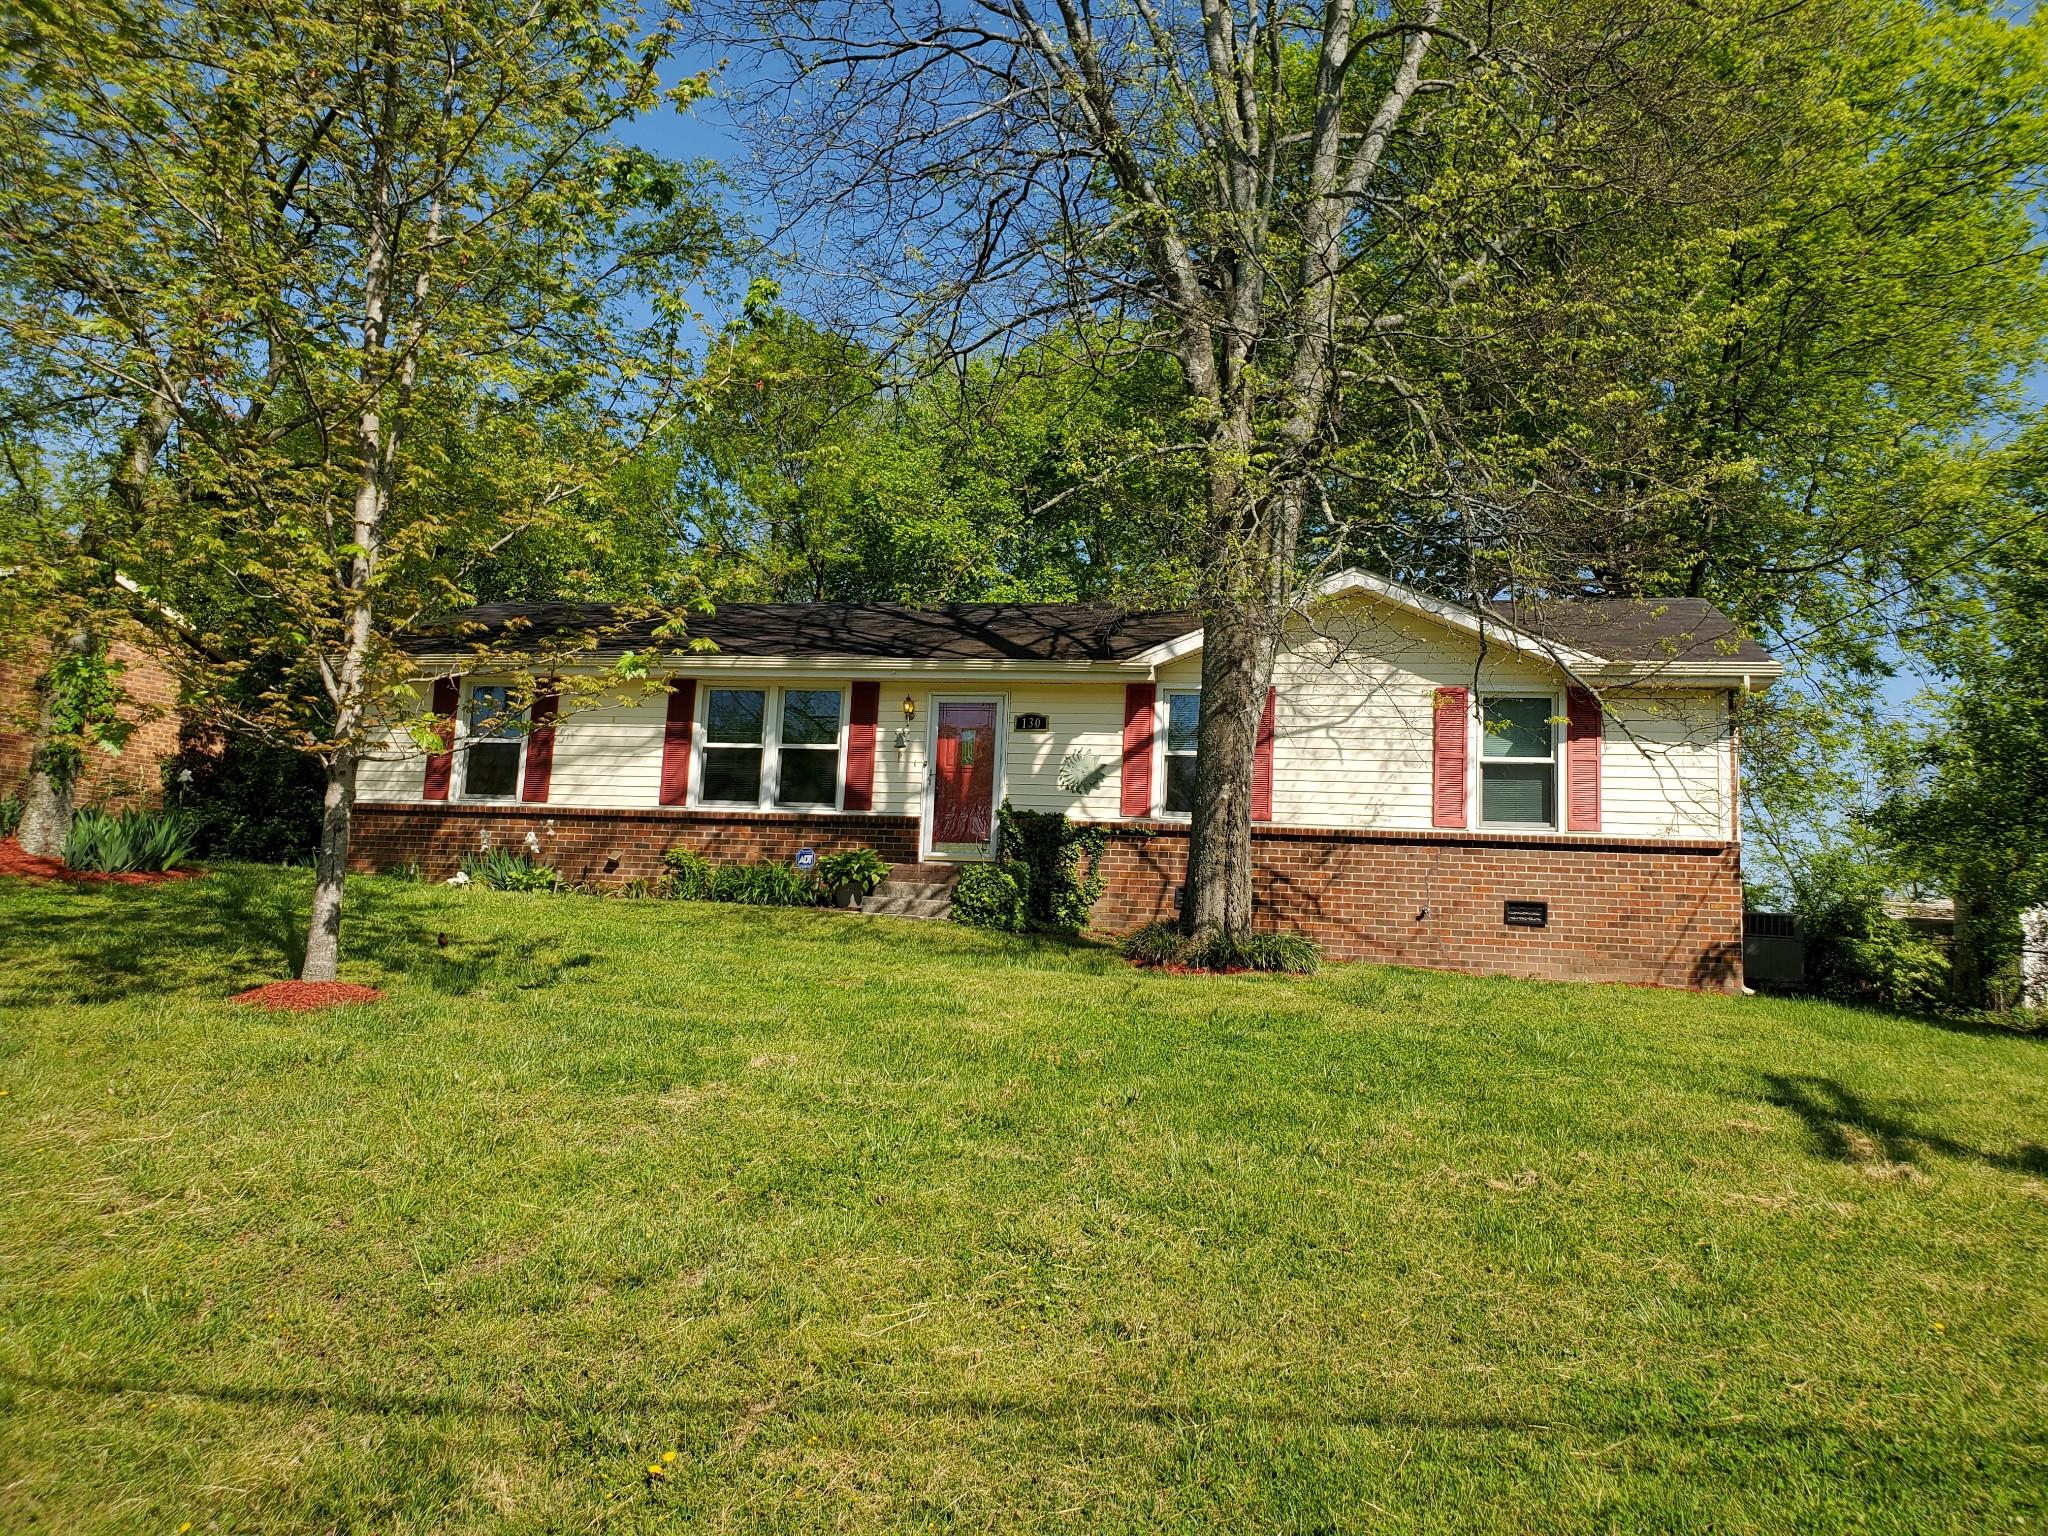 130 Hillside Dr Property Photo - Hendersonville, TN real estate listing